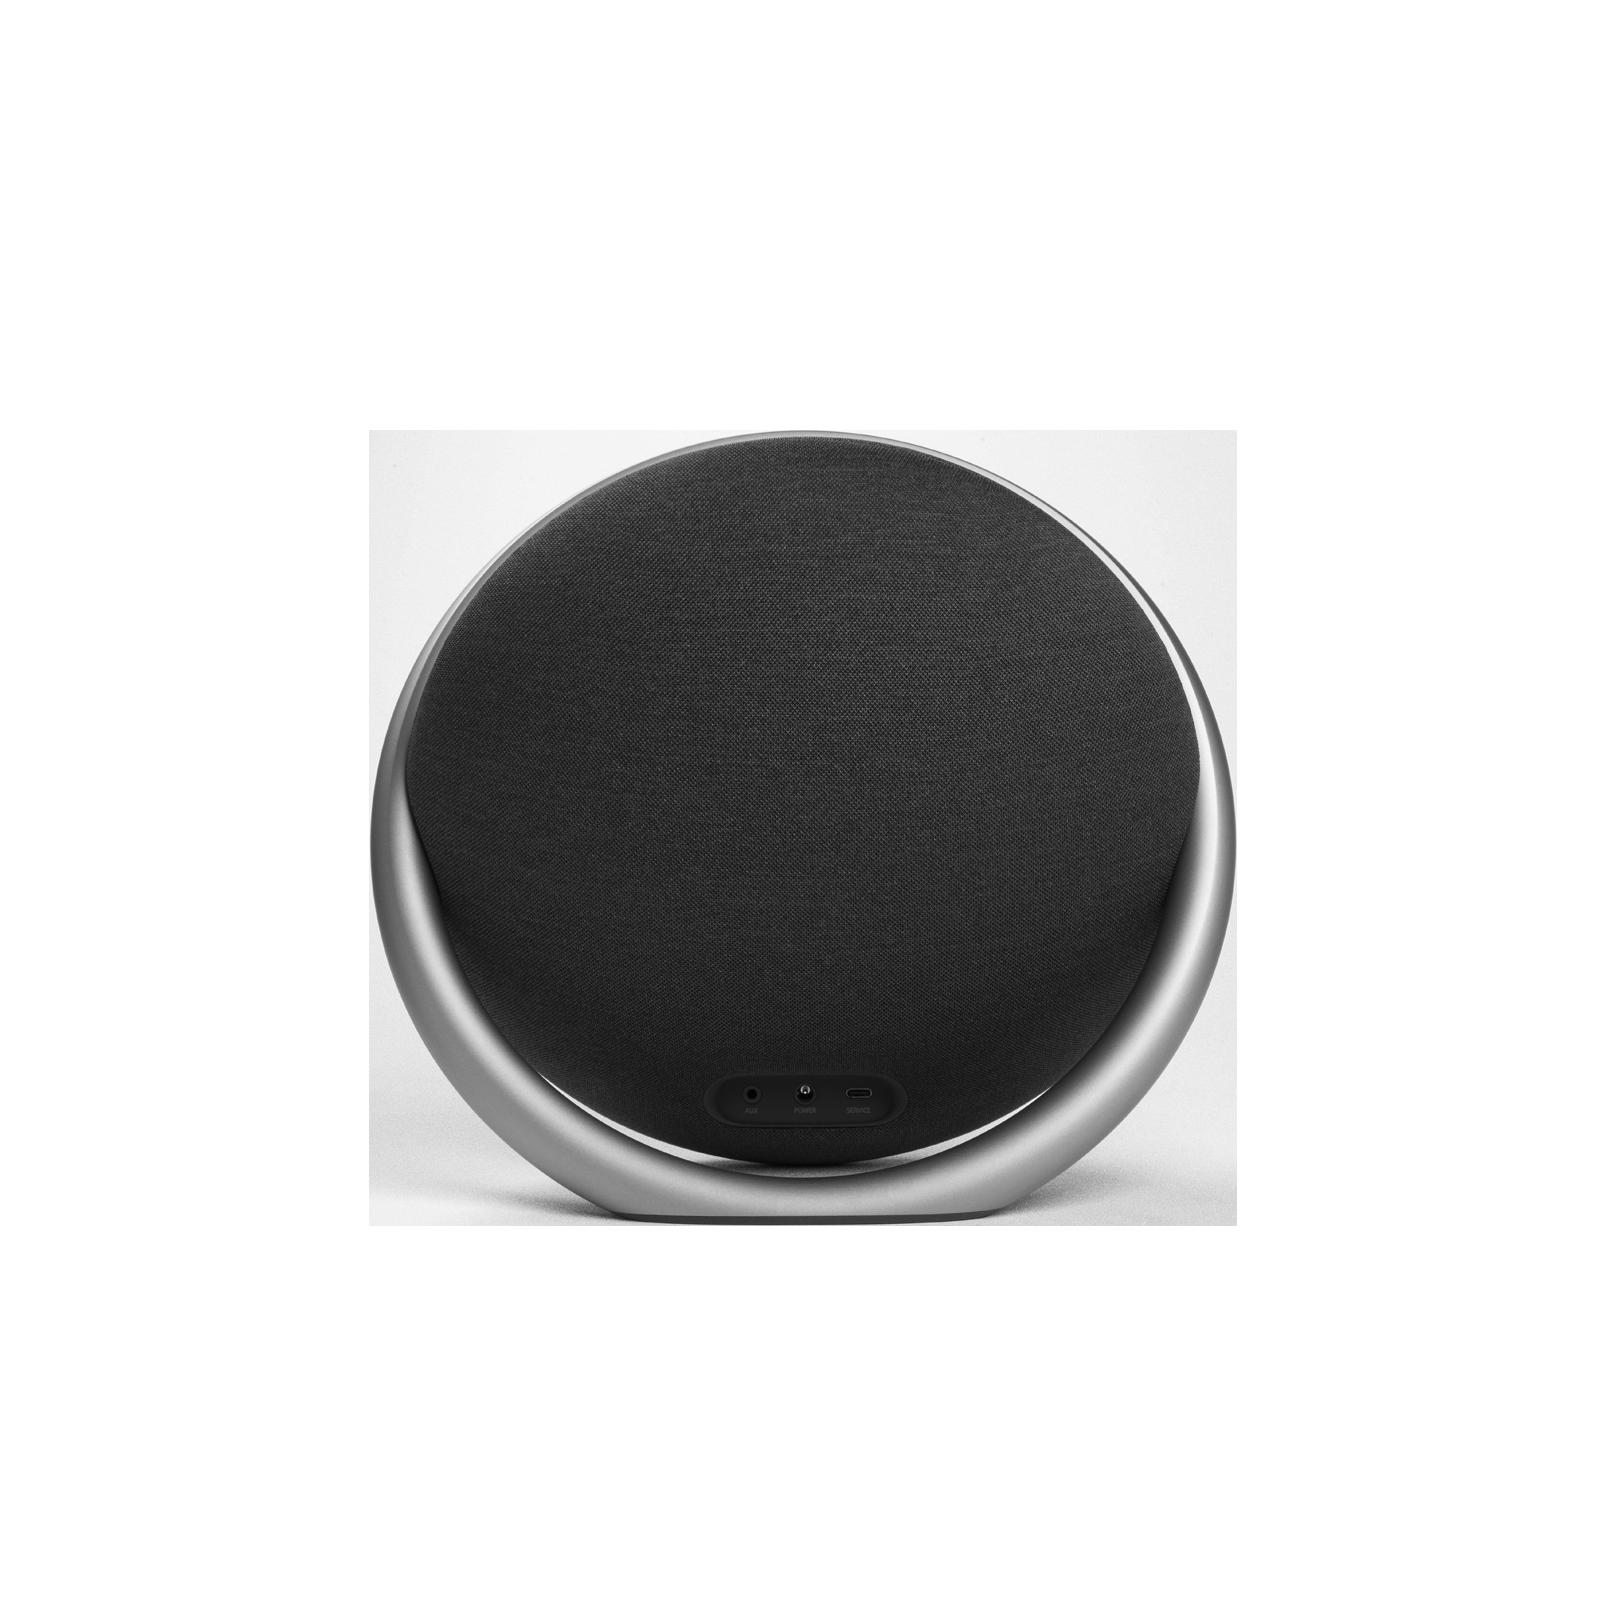 Onyx Studio 7 - Black - Portable Stereo Bluetooth Speaker - Back